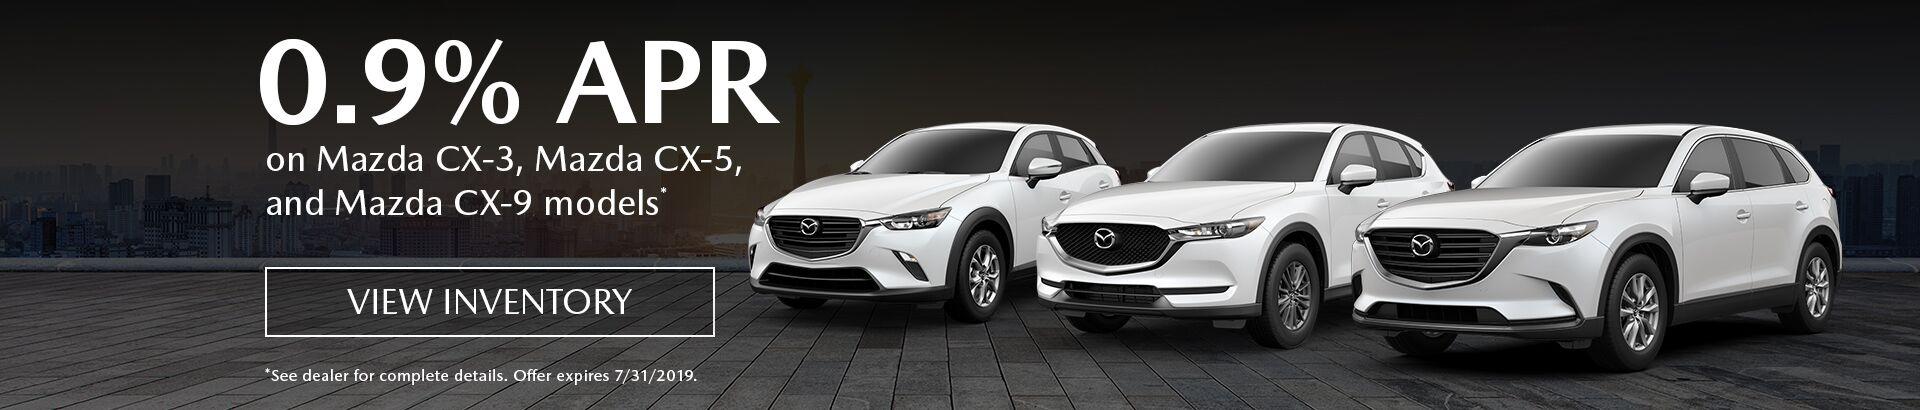 Mazda Dealership Near Me >> Cardinaleway A Mazda Dealer In Las Vegas Serving Henderson